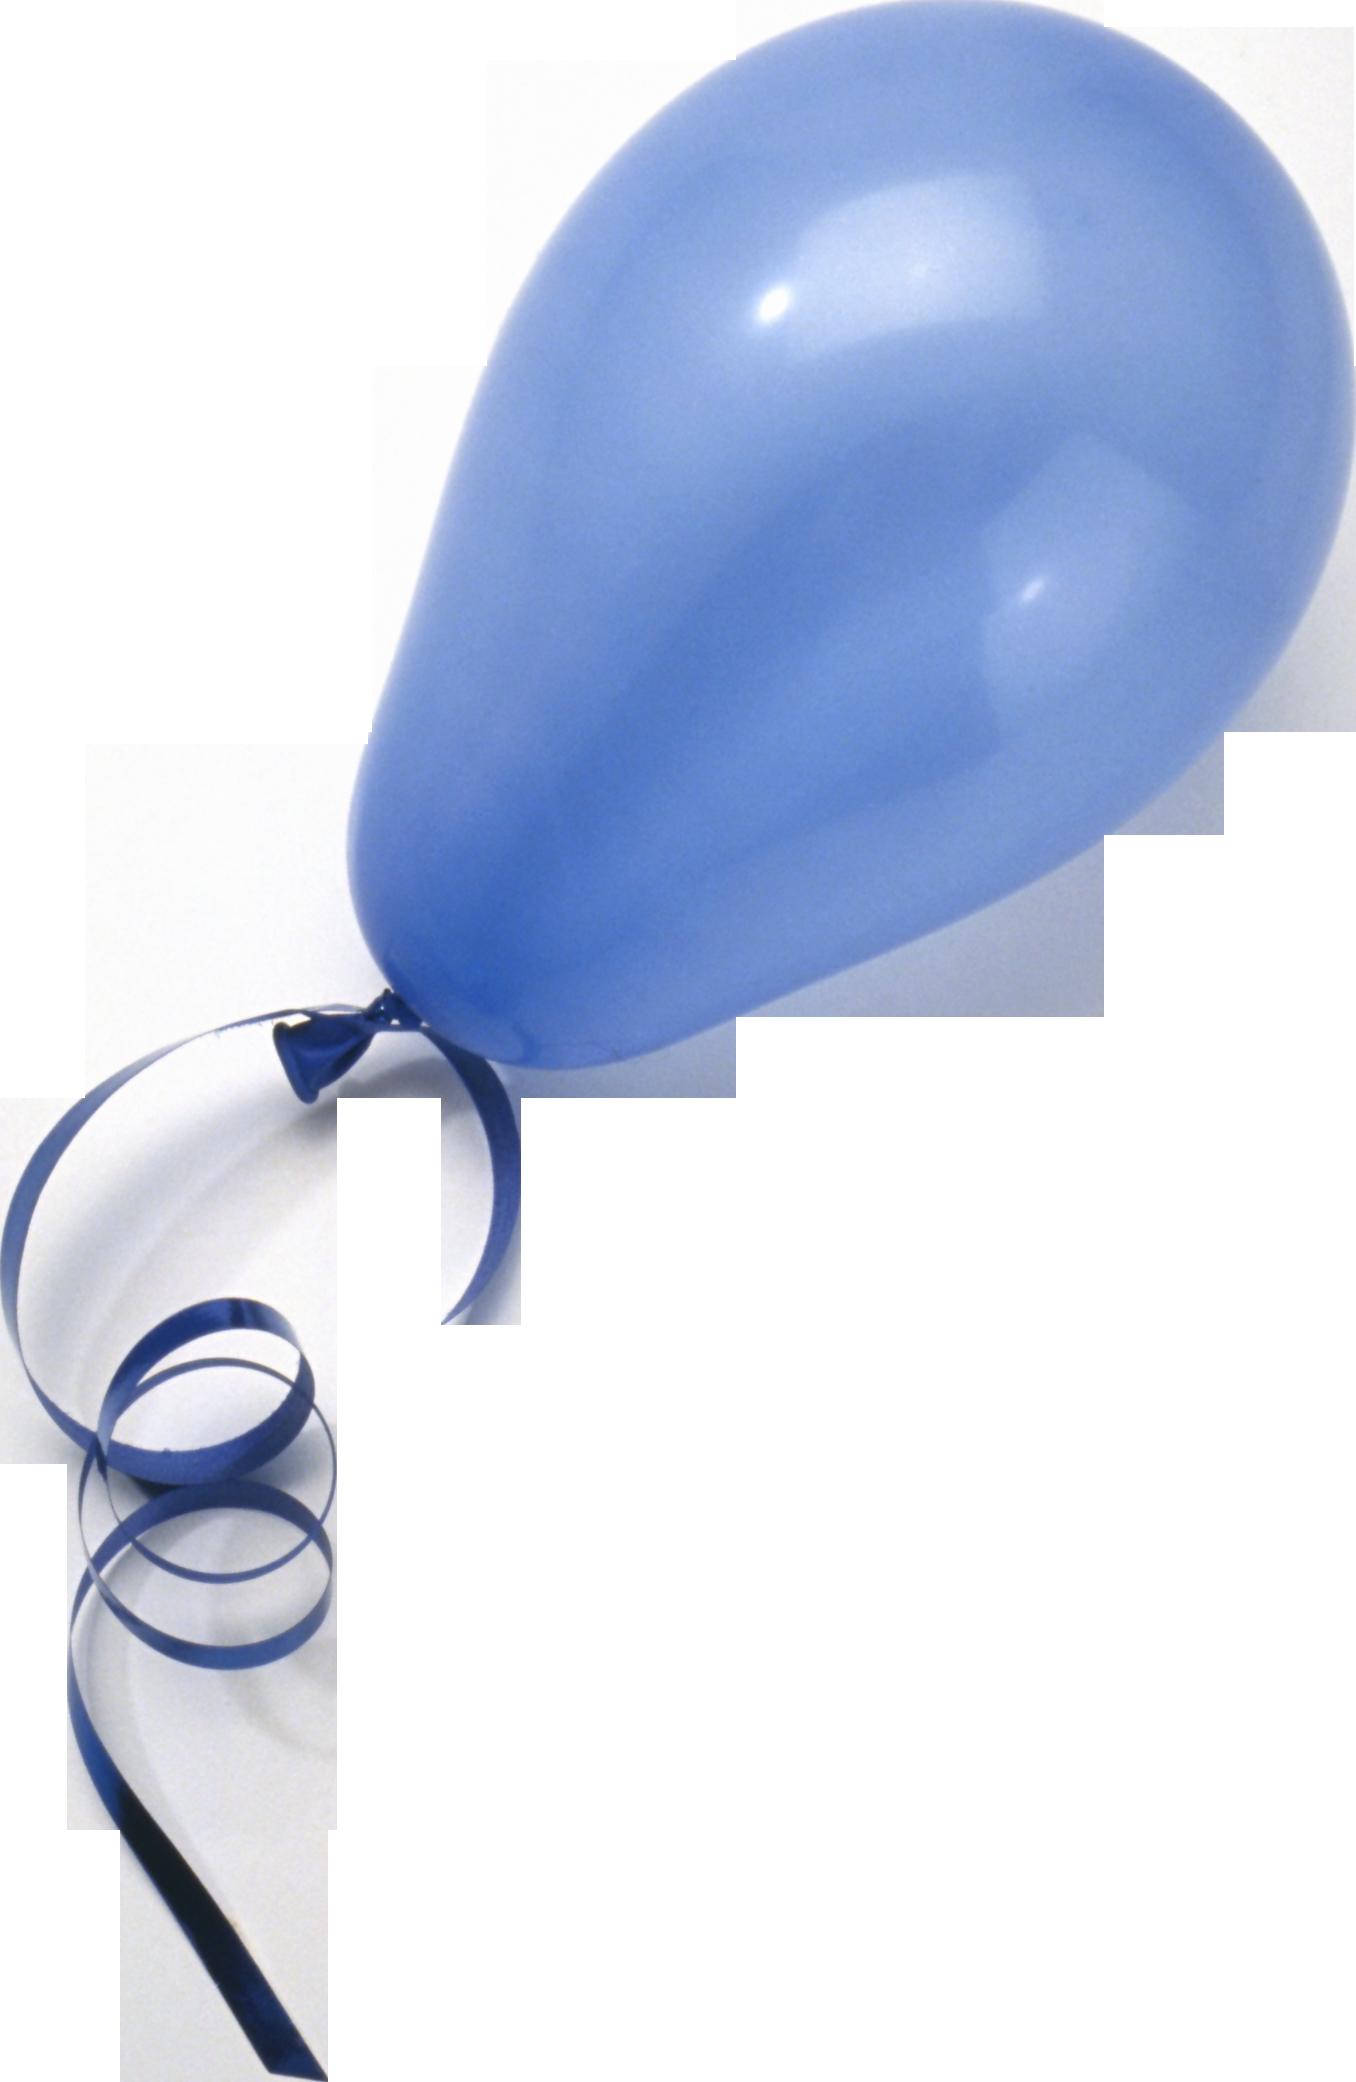 Png image sb b. Clipart balloon dark blue